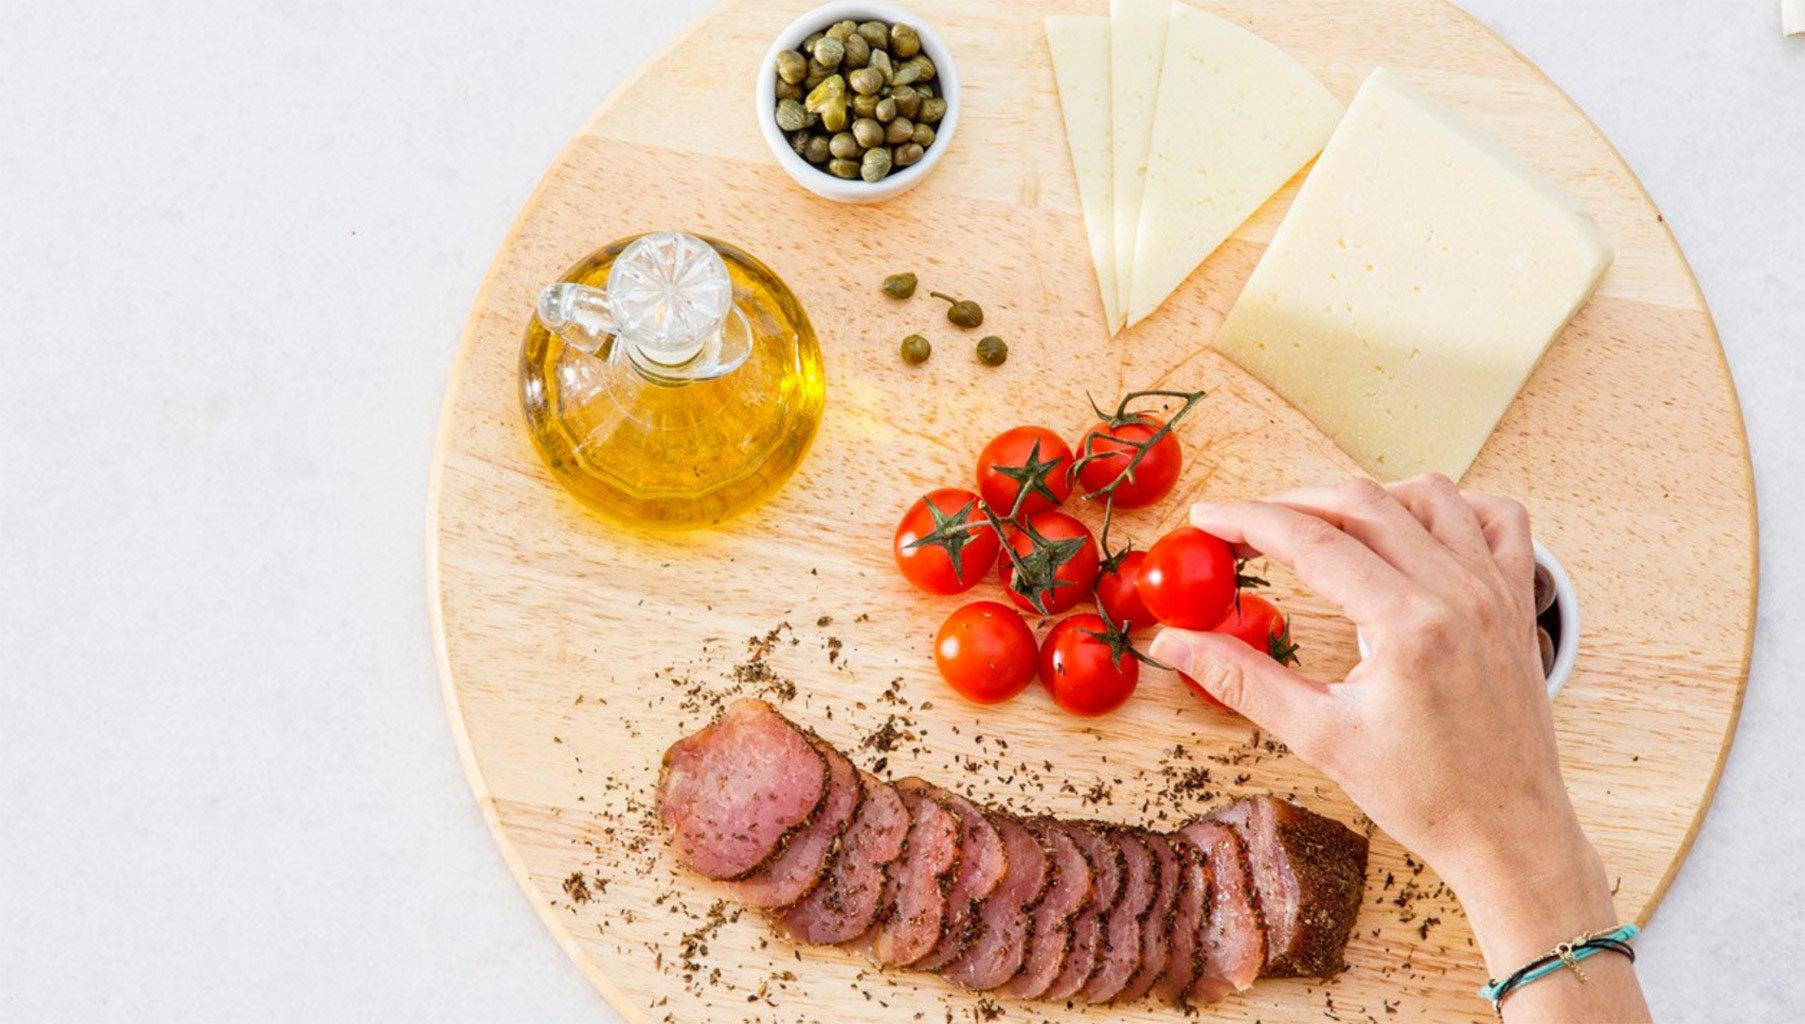 food plate meat fruit cuisine baking vegetable sliced